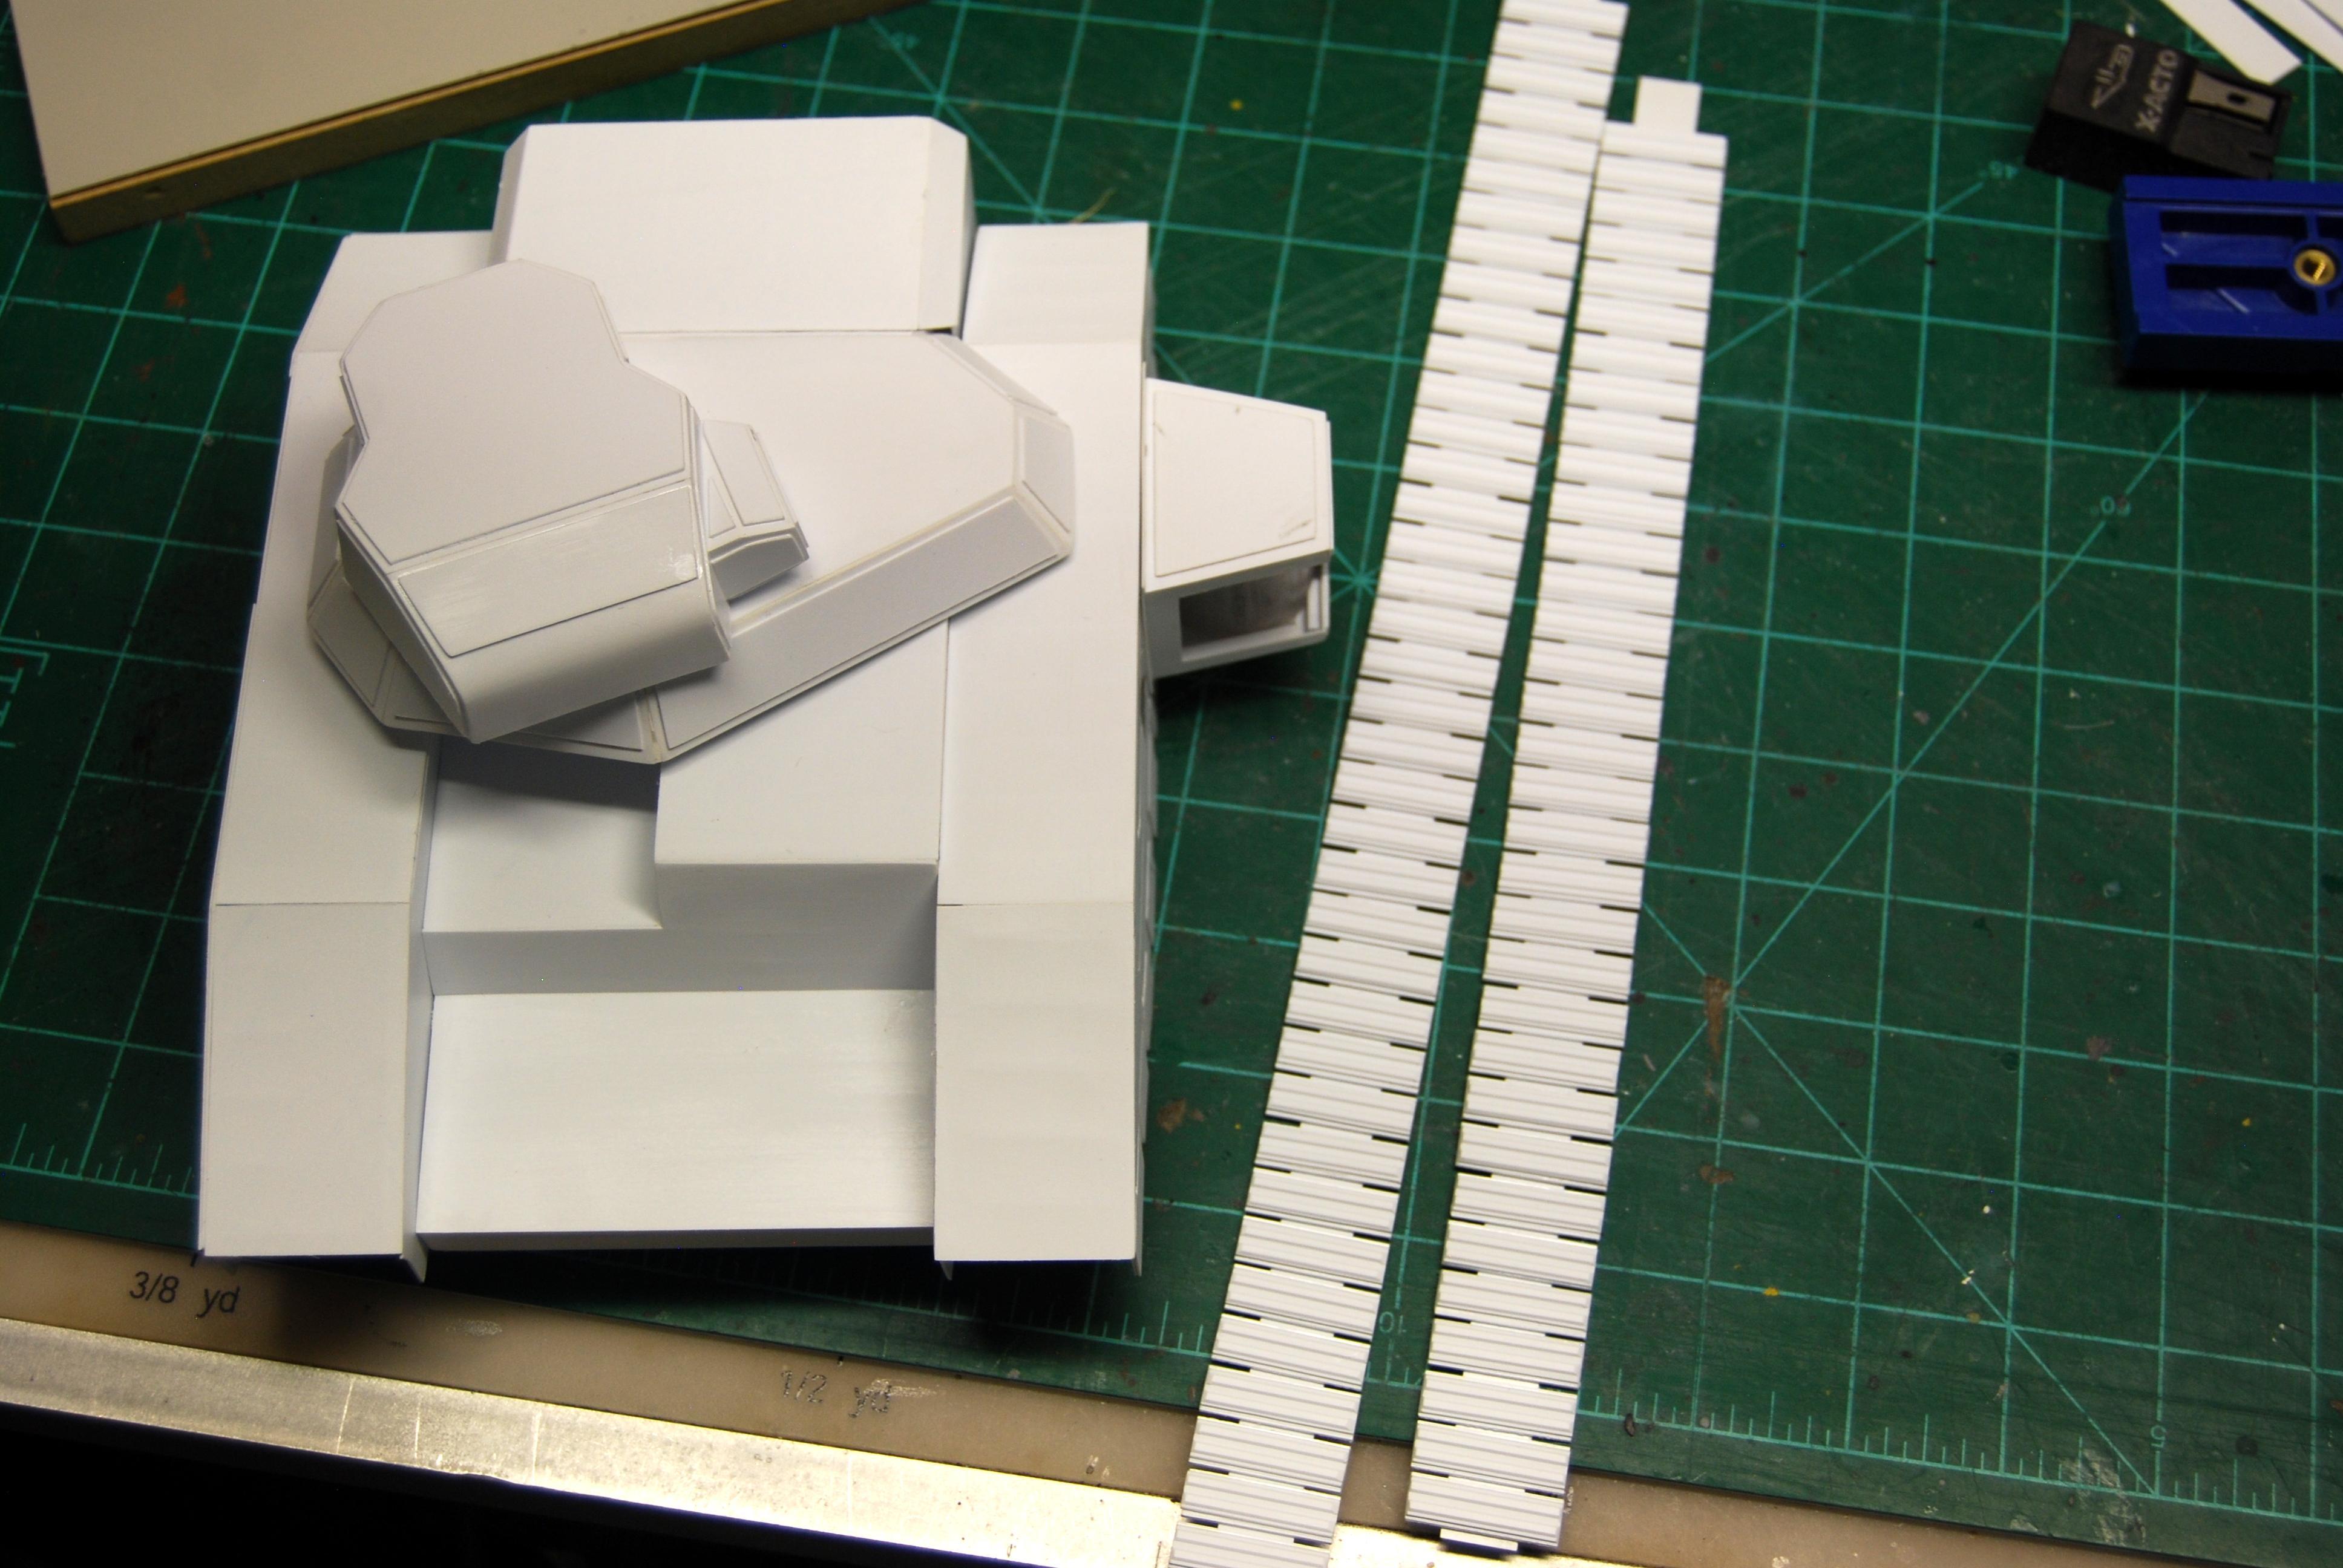 Baneblade, Built, Imperial, Scratch, Scratch Build, Tank